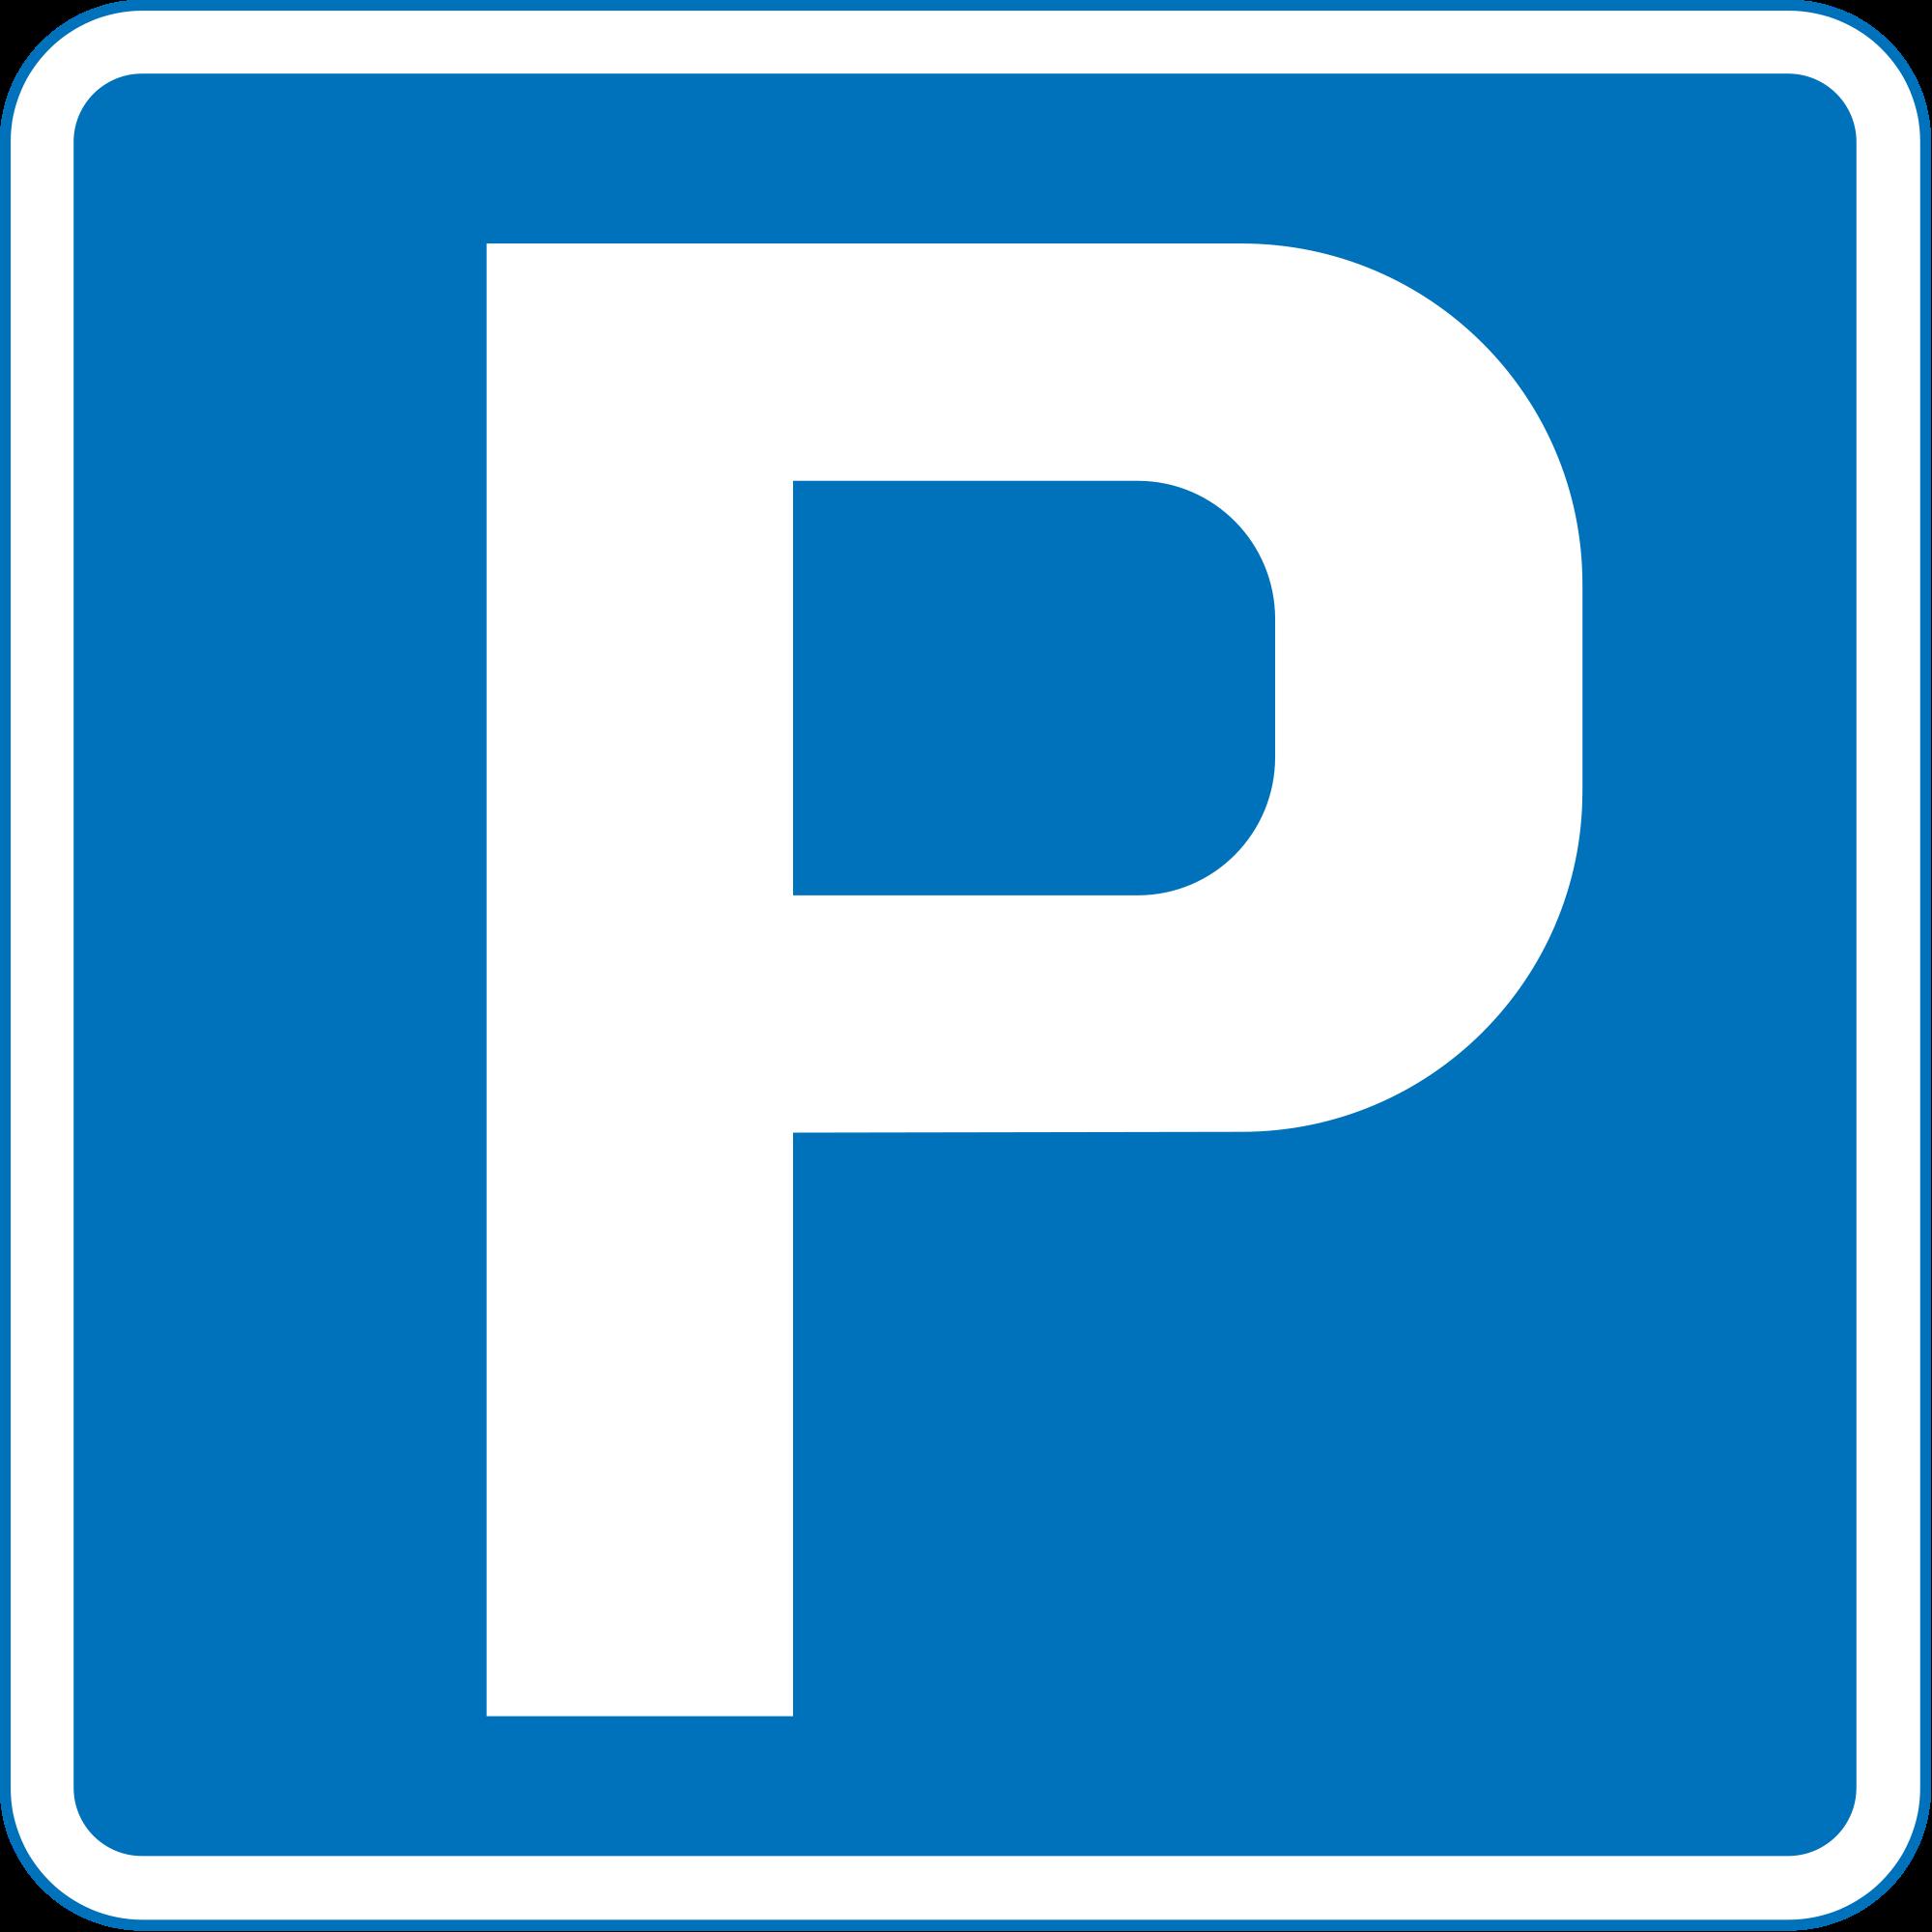 A blue mood over car parking.